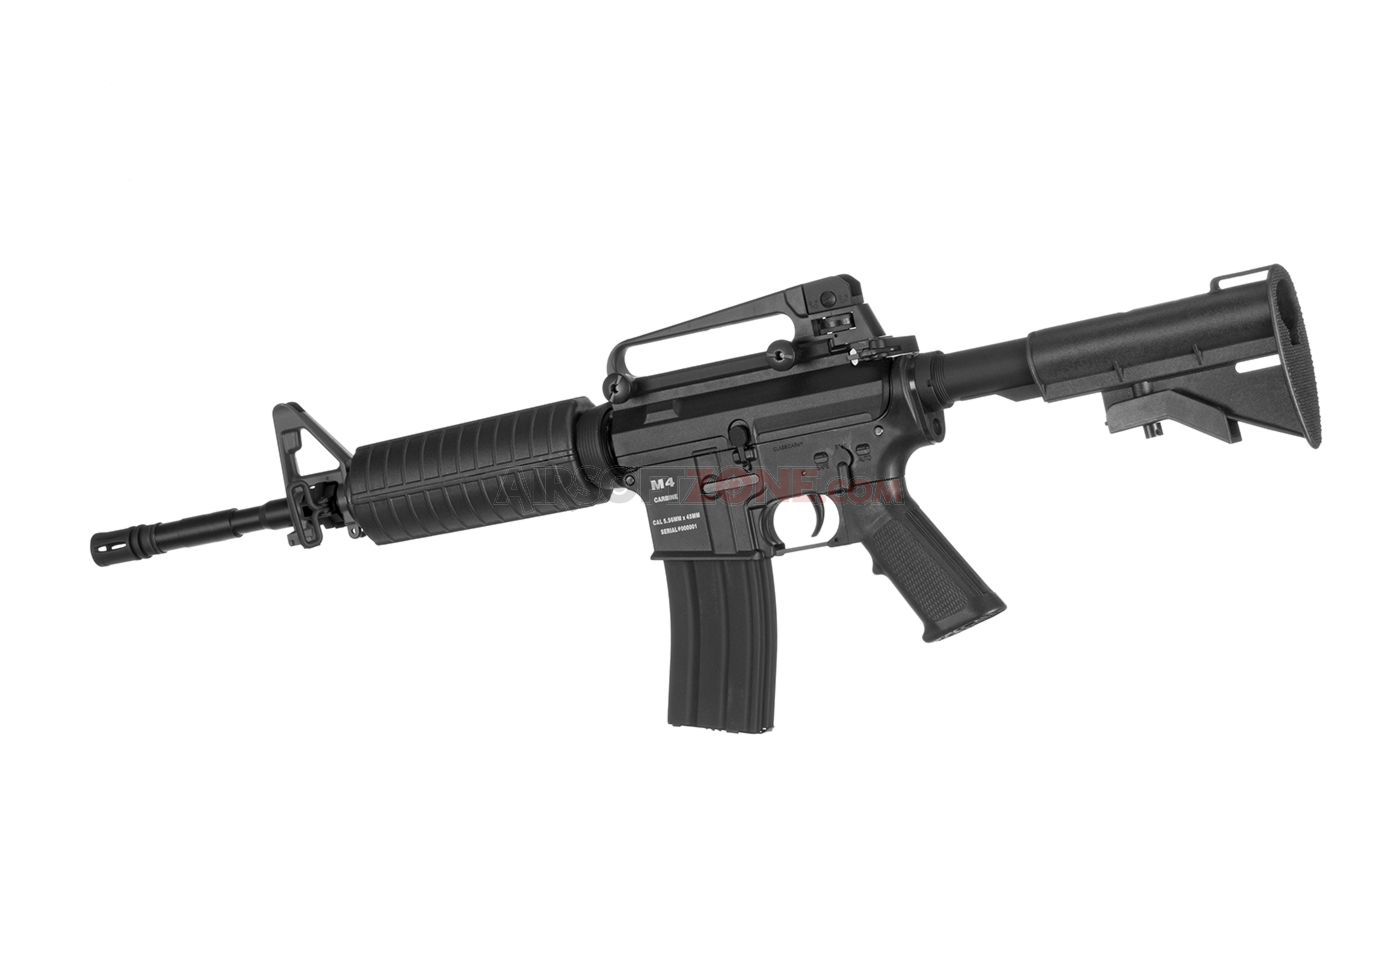 M4 A1 Sportline